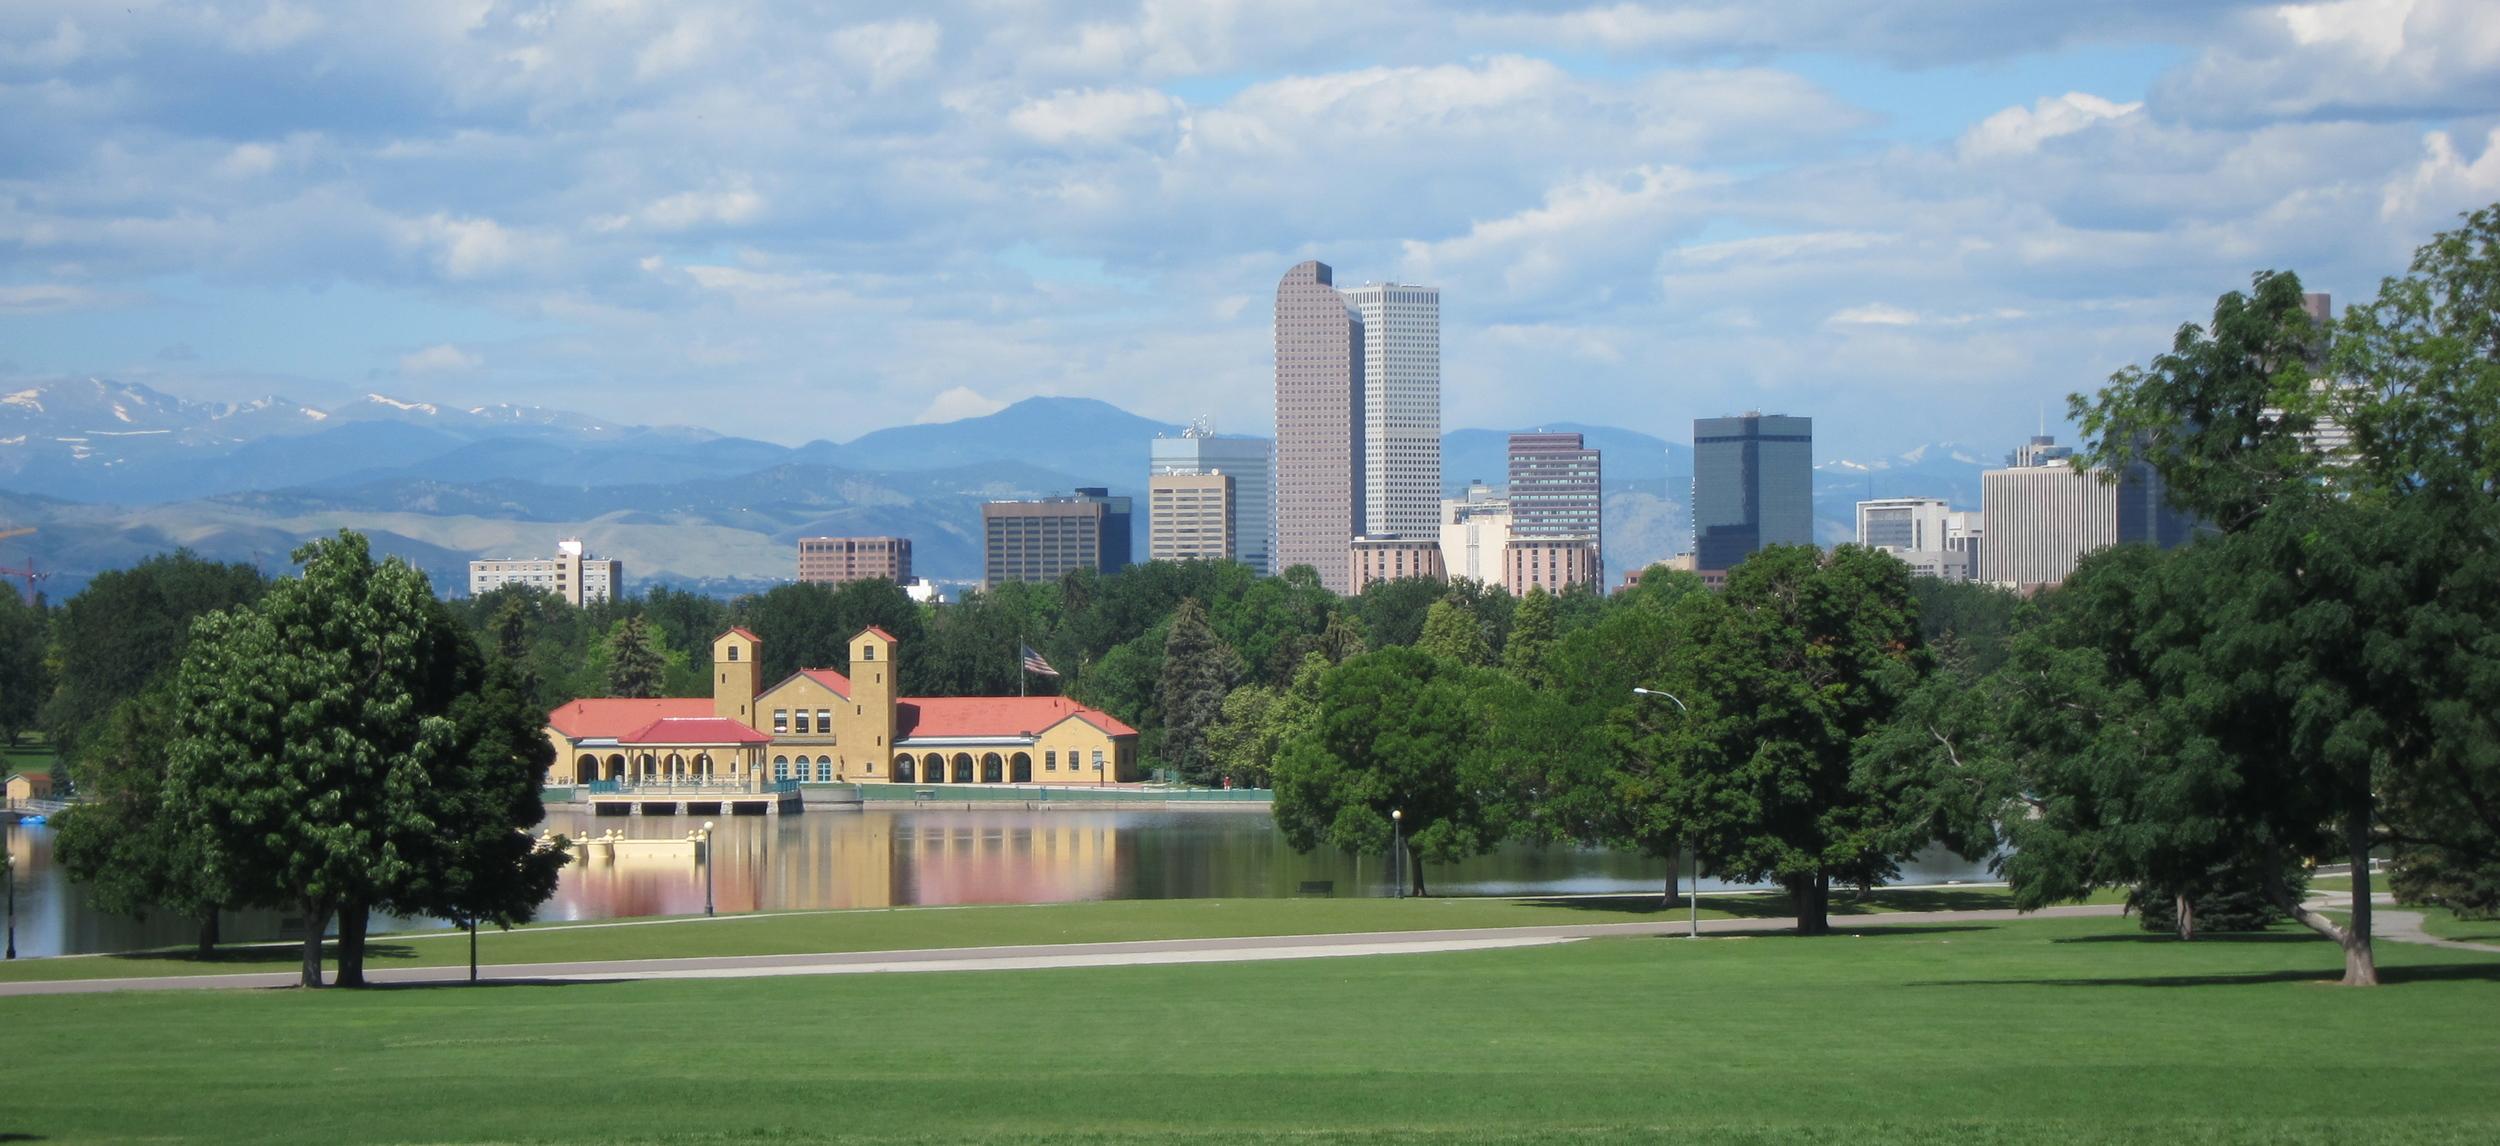 Denver's City Park, captured by my Love